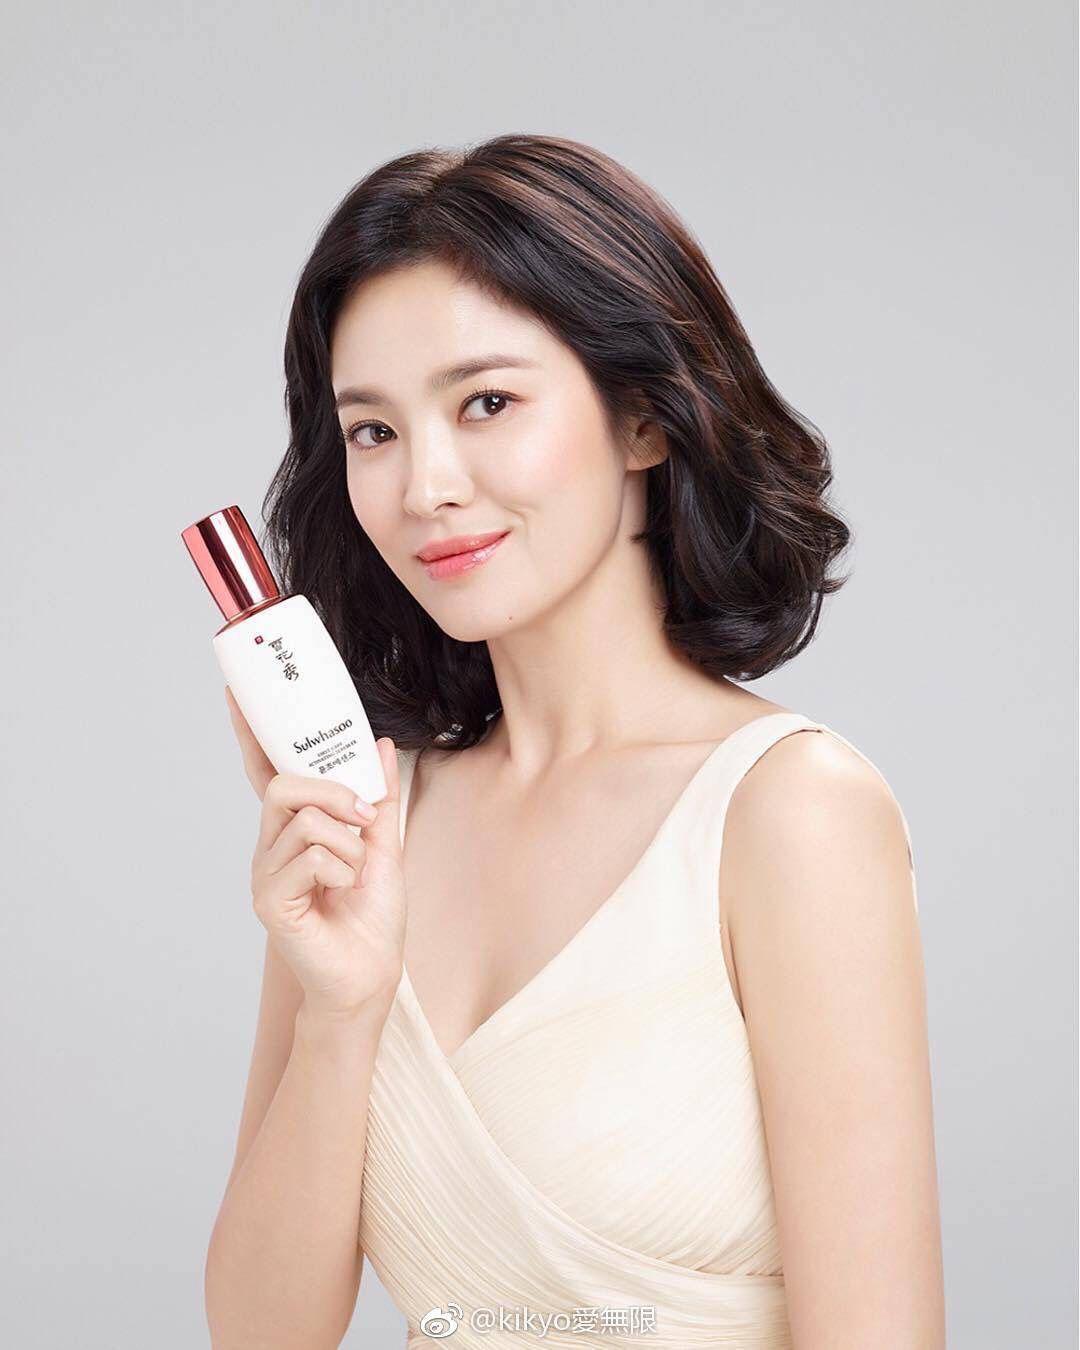 Song hye kyo 2018